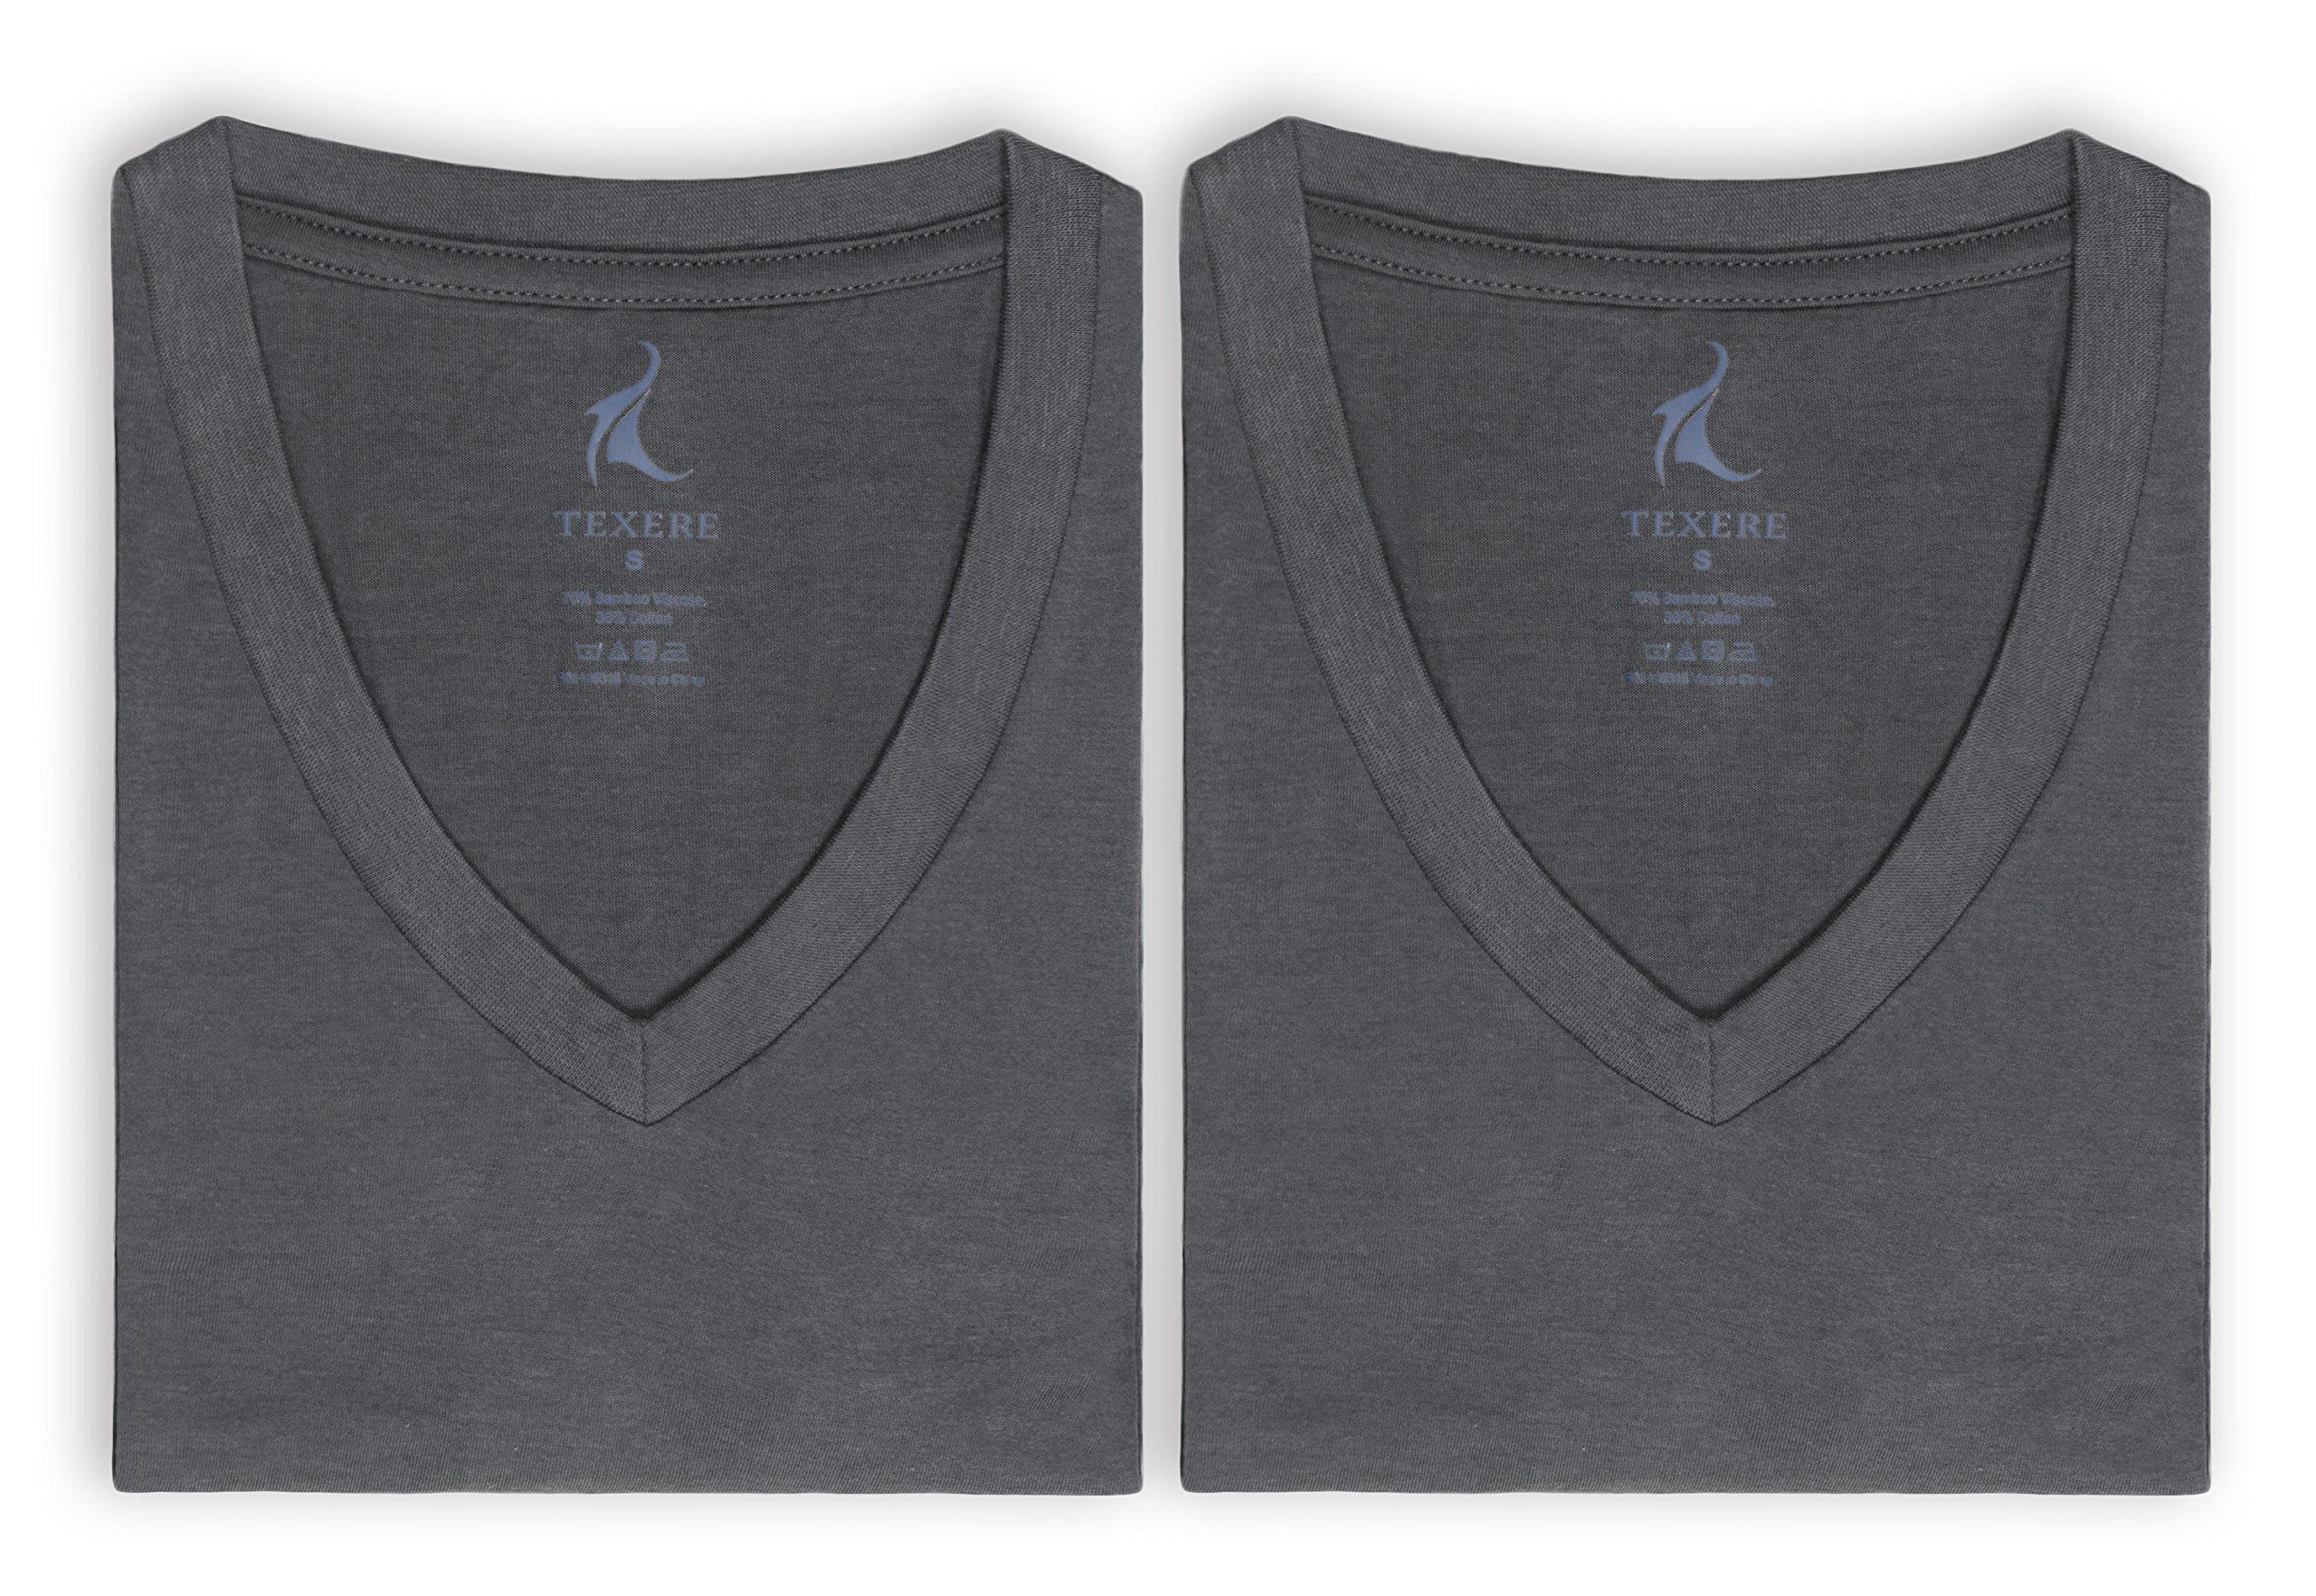 Texere Men's V-Neck 2 Pack Undershirt (Meio, Charcoal, XXLT) Luxury Undershirt by TexereSilk